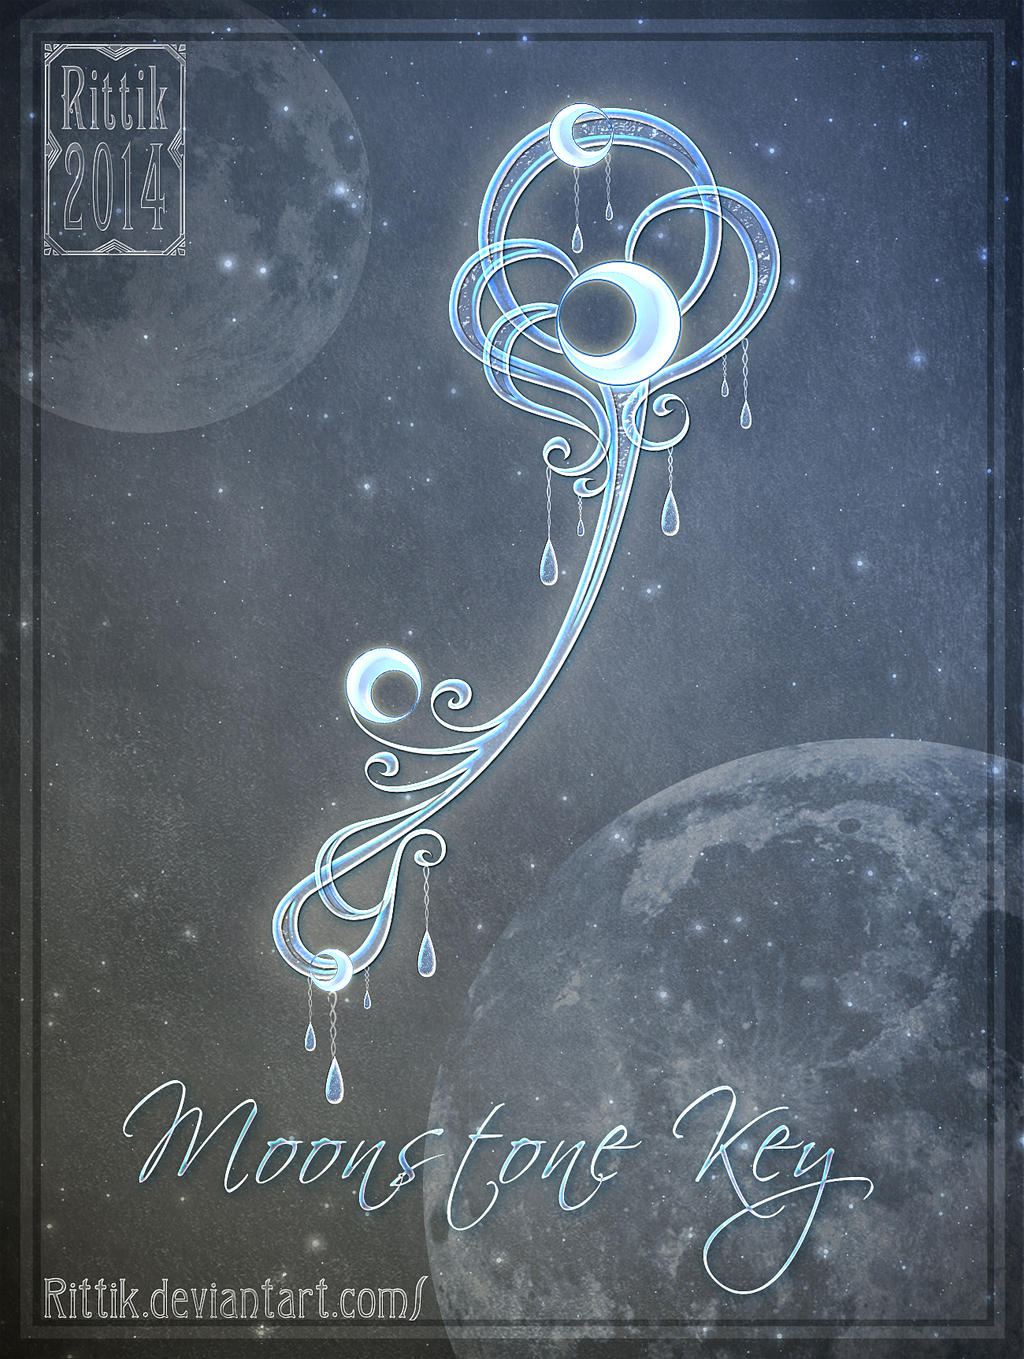 Moonstone Key by Rittik